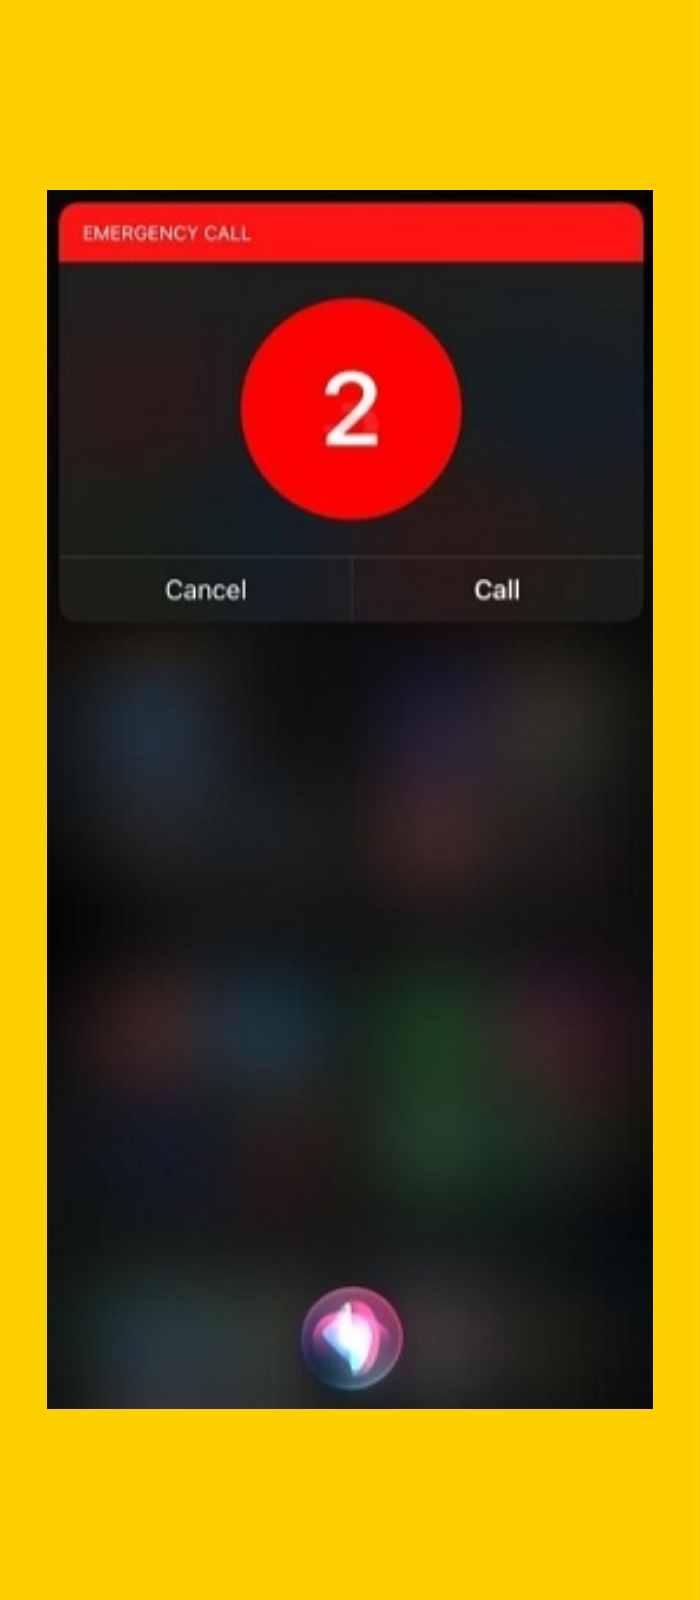 Trying to make an emergency call using Siri